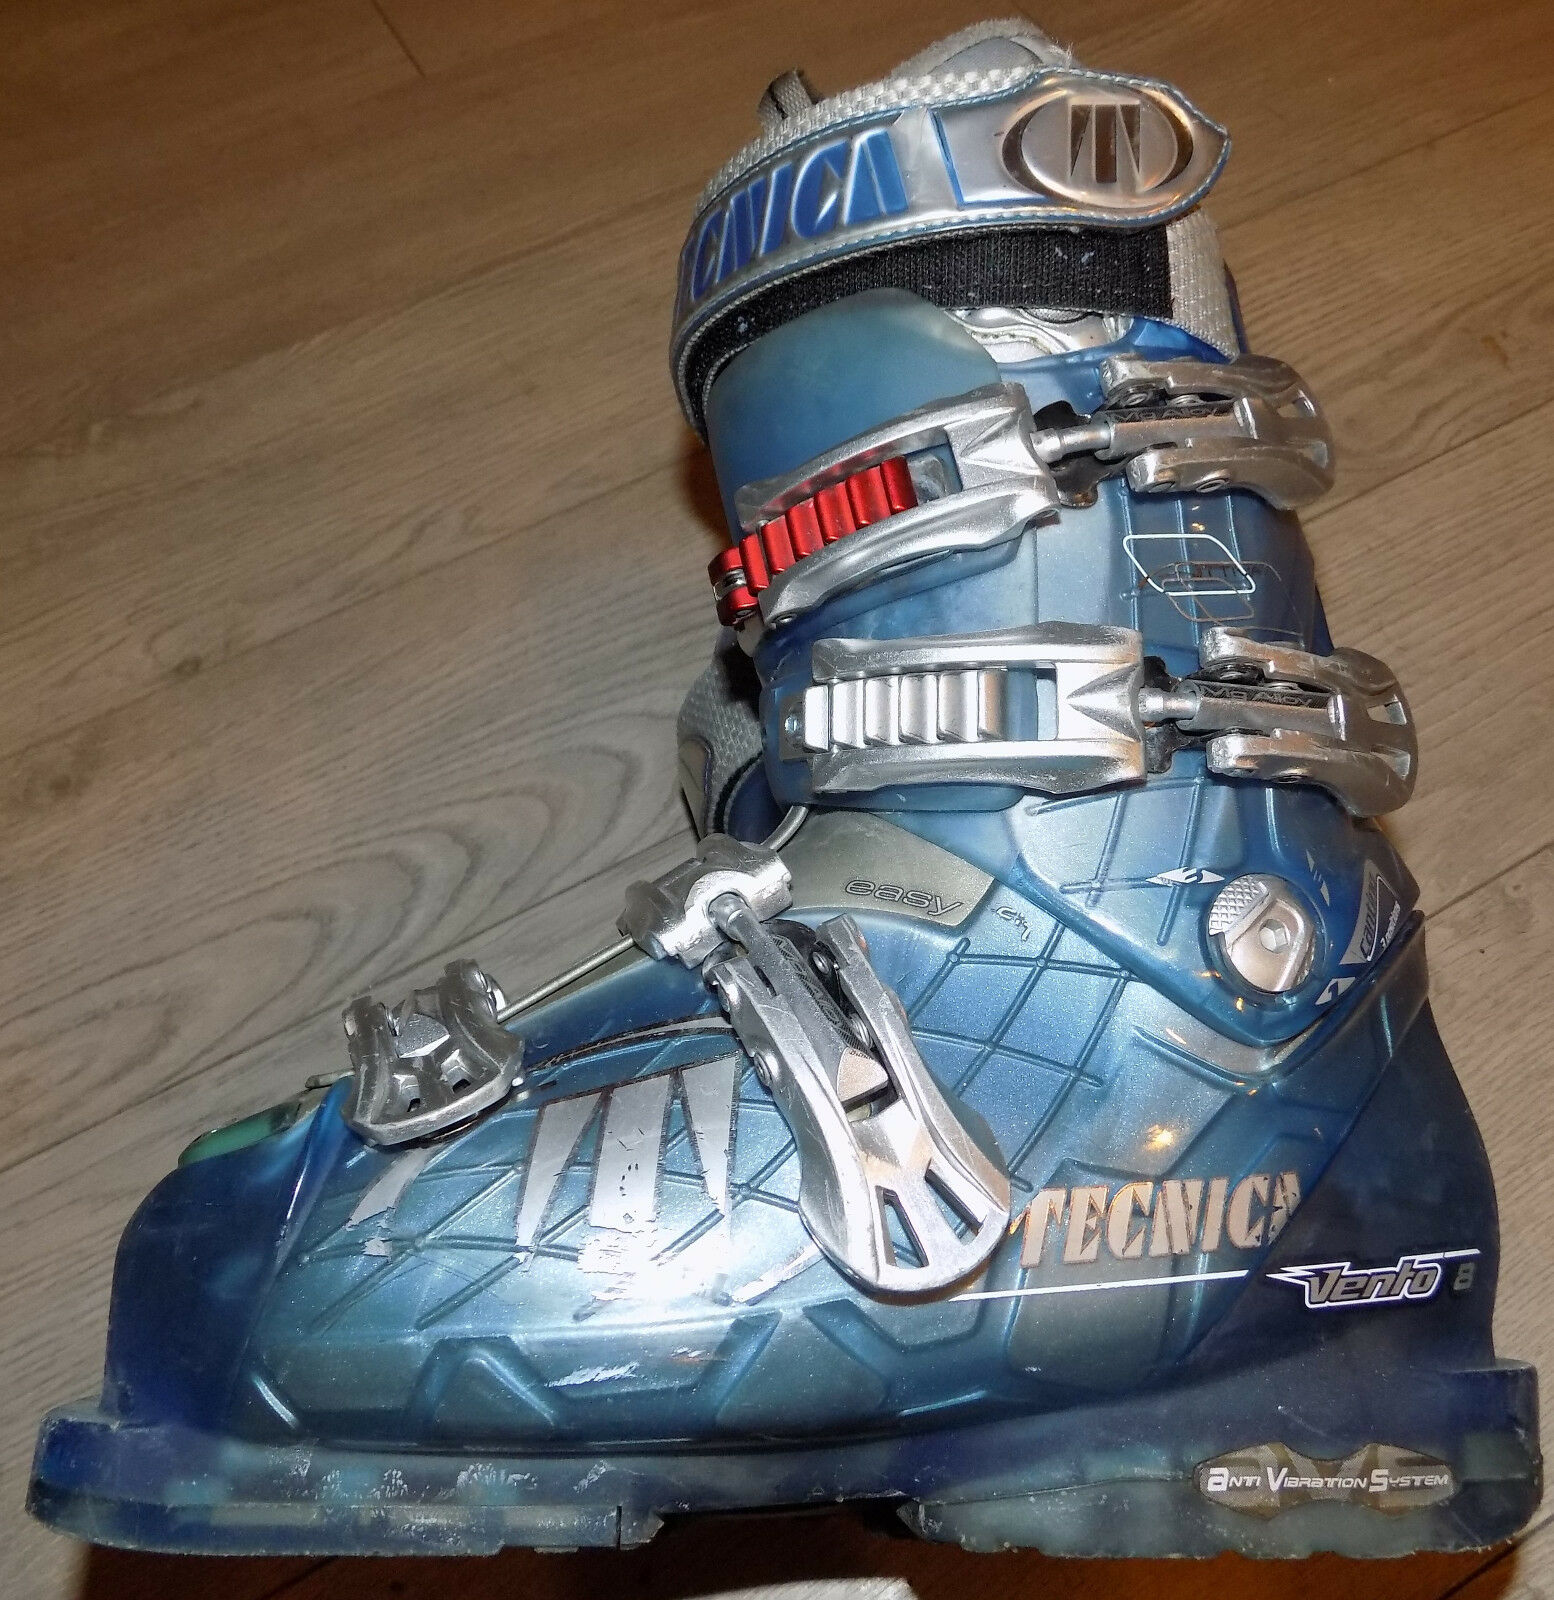 Pre-owned Tecnica Vento 8 Ski Boots 23-23.5 Mens Size 5-5.5 Womens Size 6-6.5